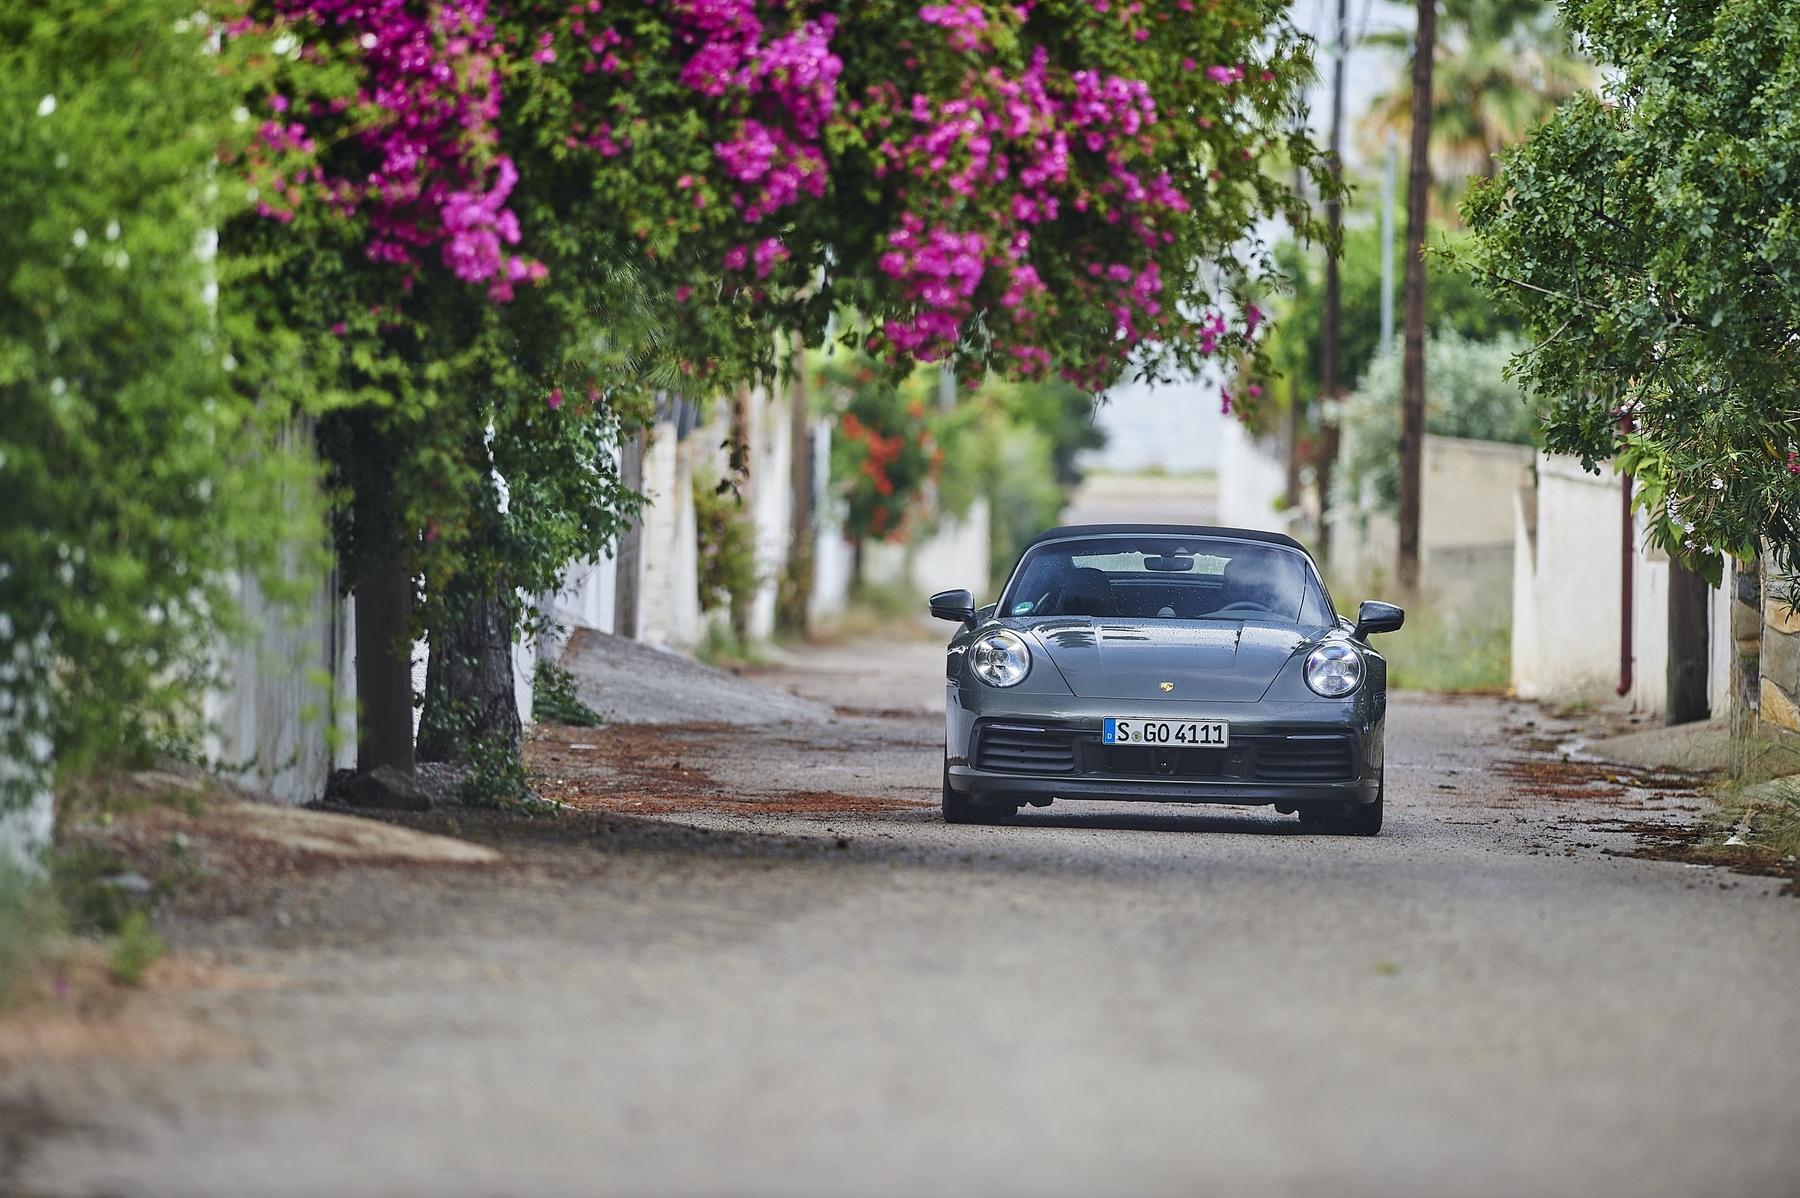 Test_Drive_Porsche_911_Athens_0108